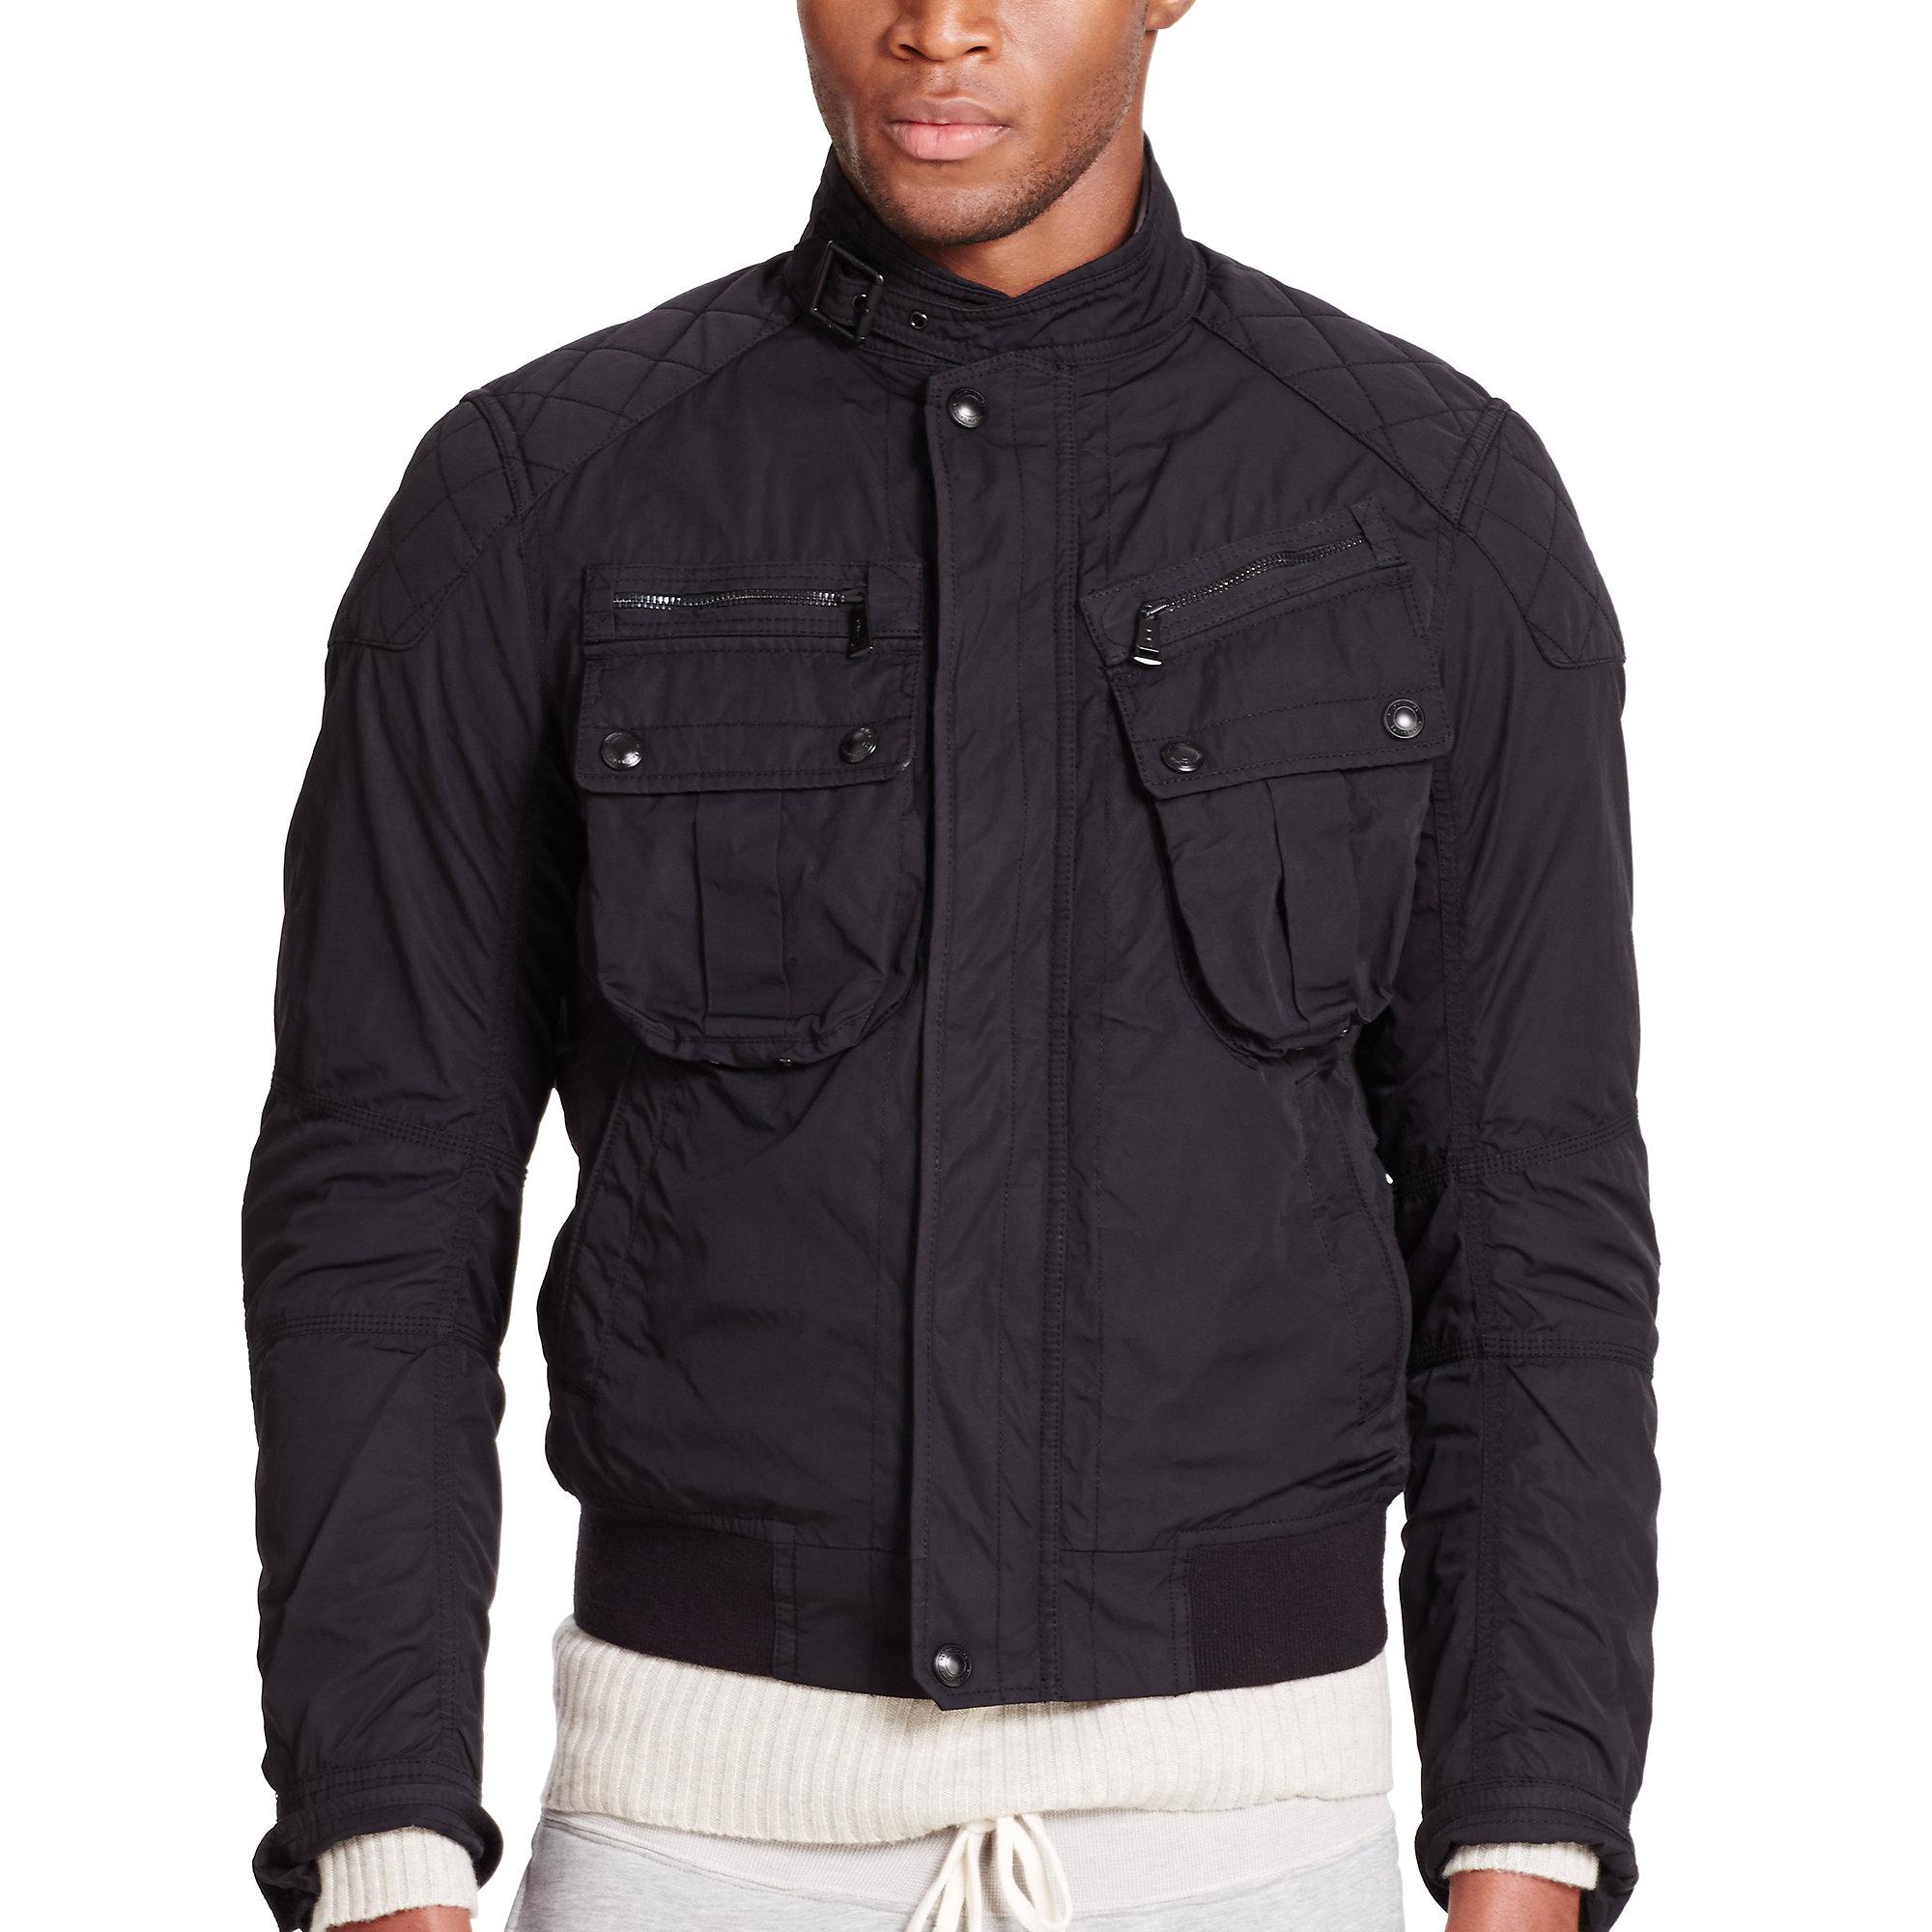 polo ralph lauren moto inspired bomber jacket in black for. Black Bedroom Furniture Sets. Home Design Ideas